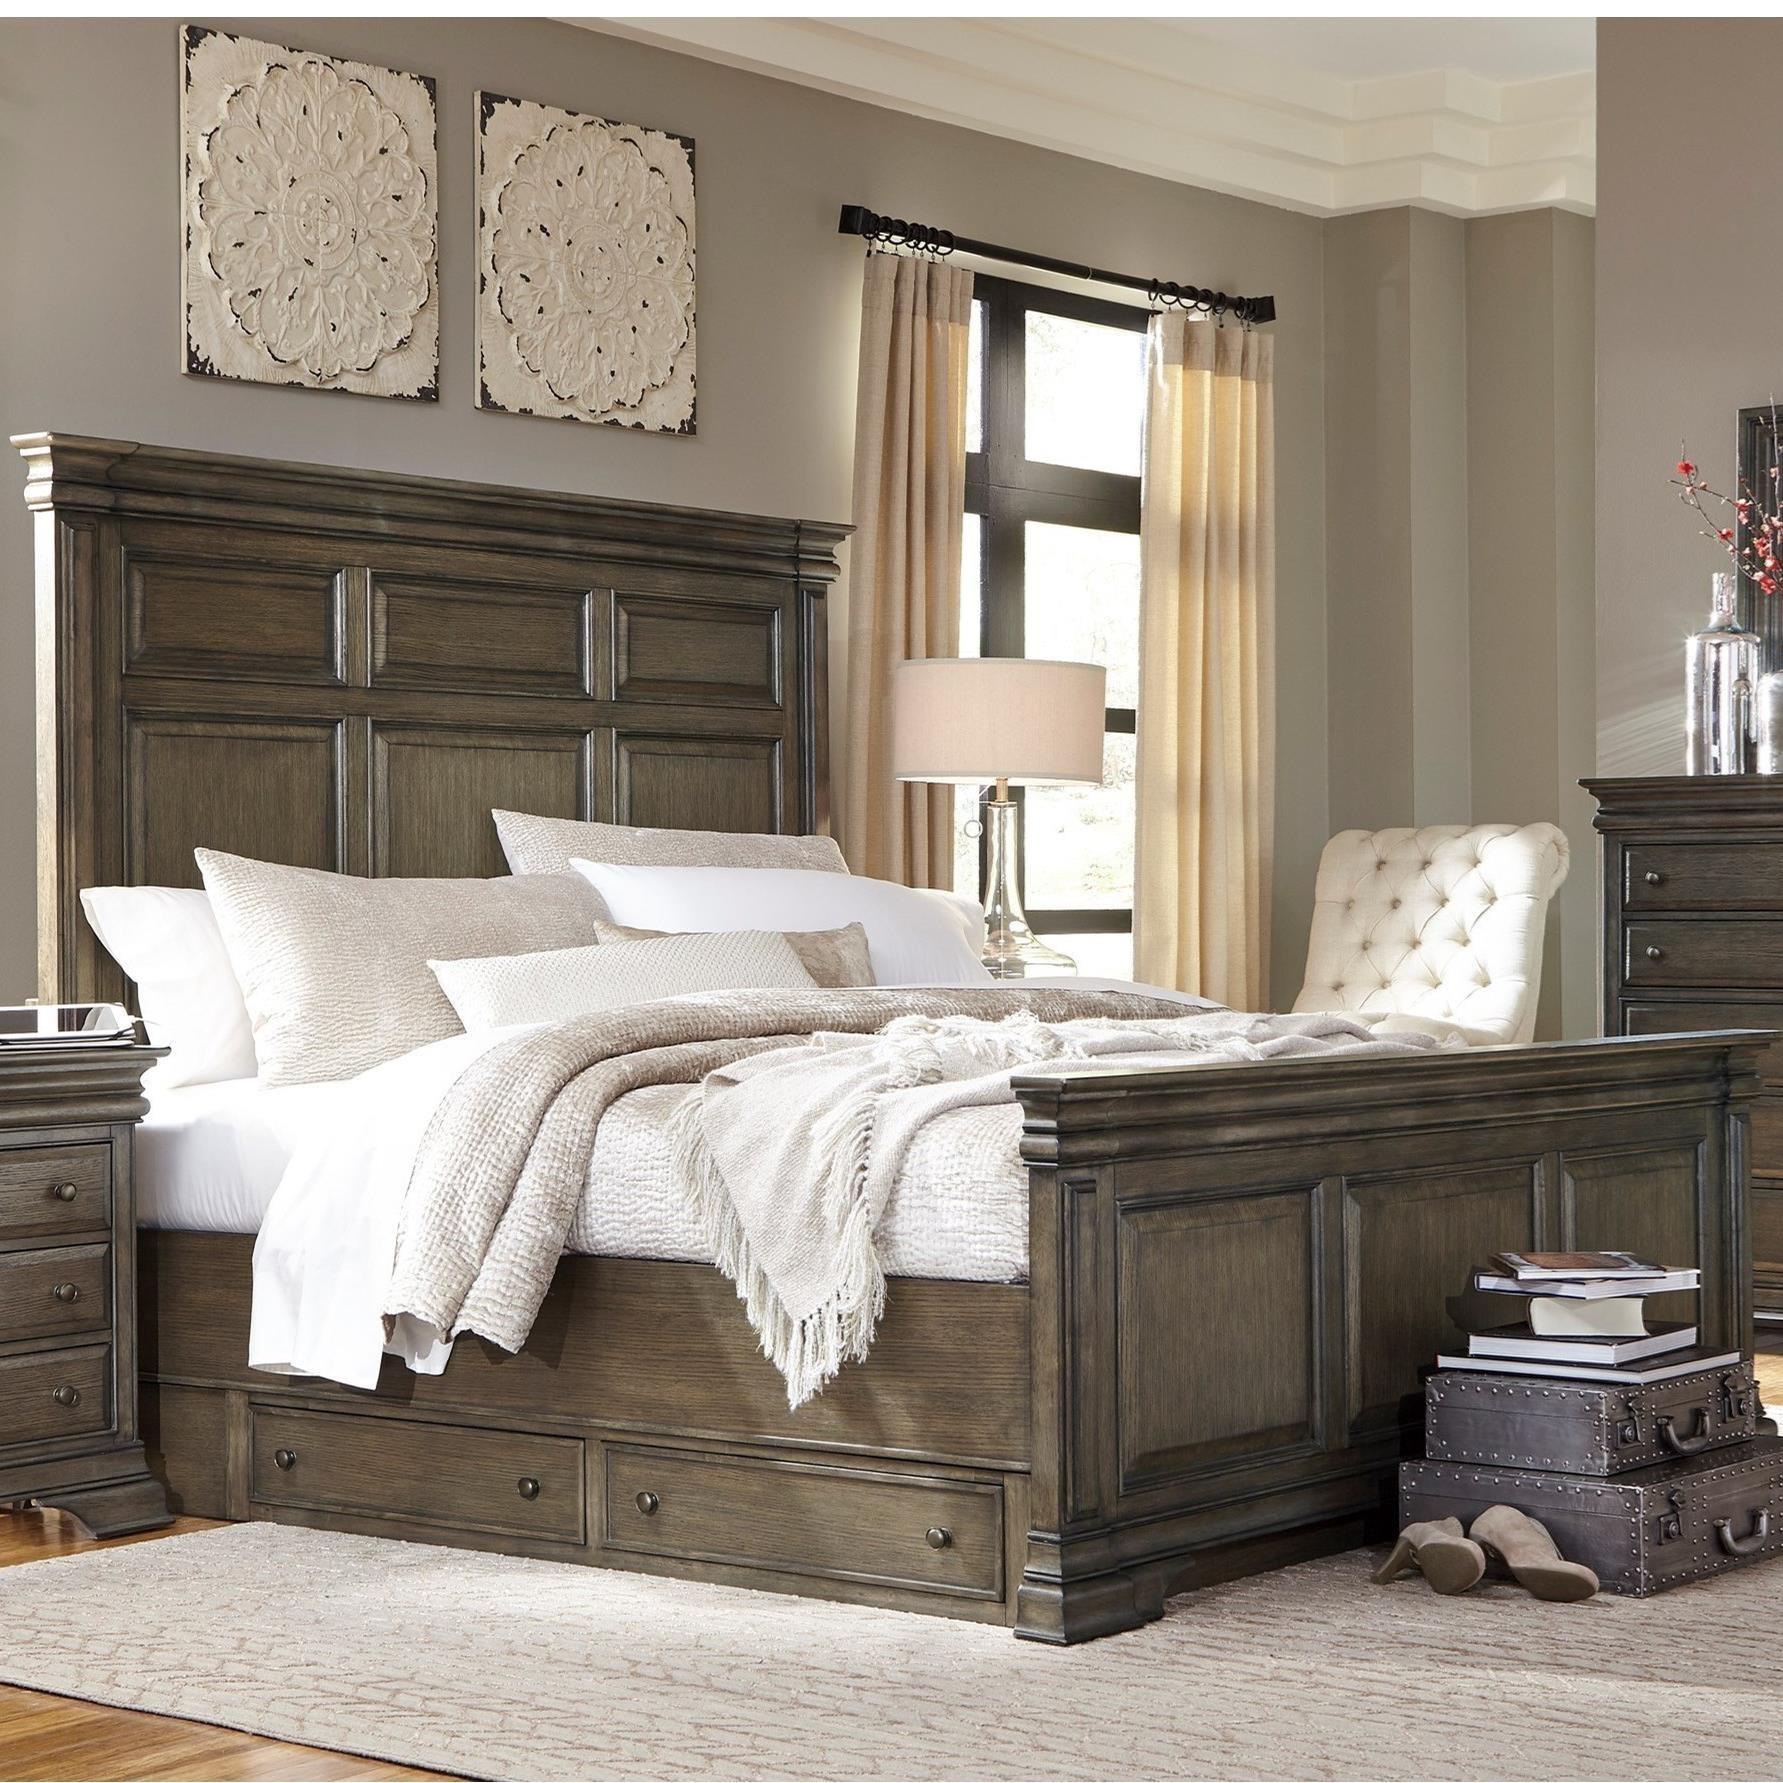 Aspenhome Arcadia King Panel Storage Bed - Item Number: I92-415-416-406-497